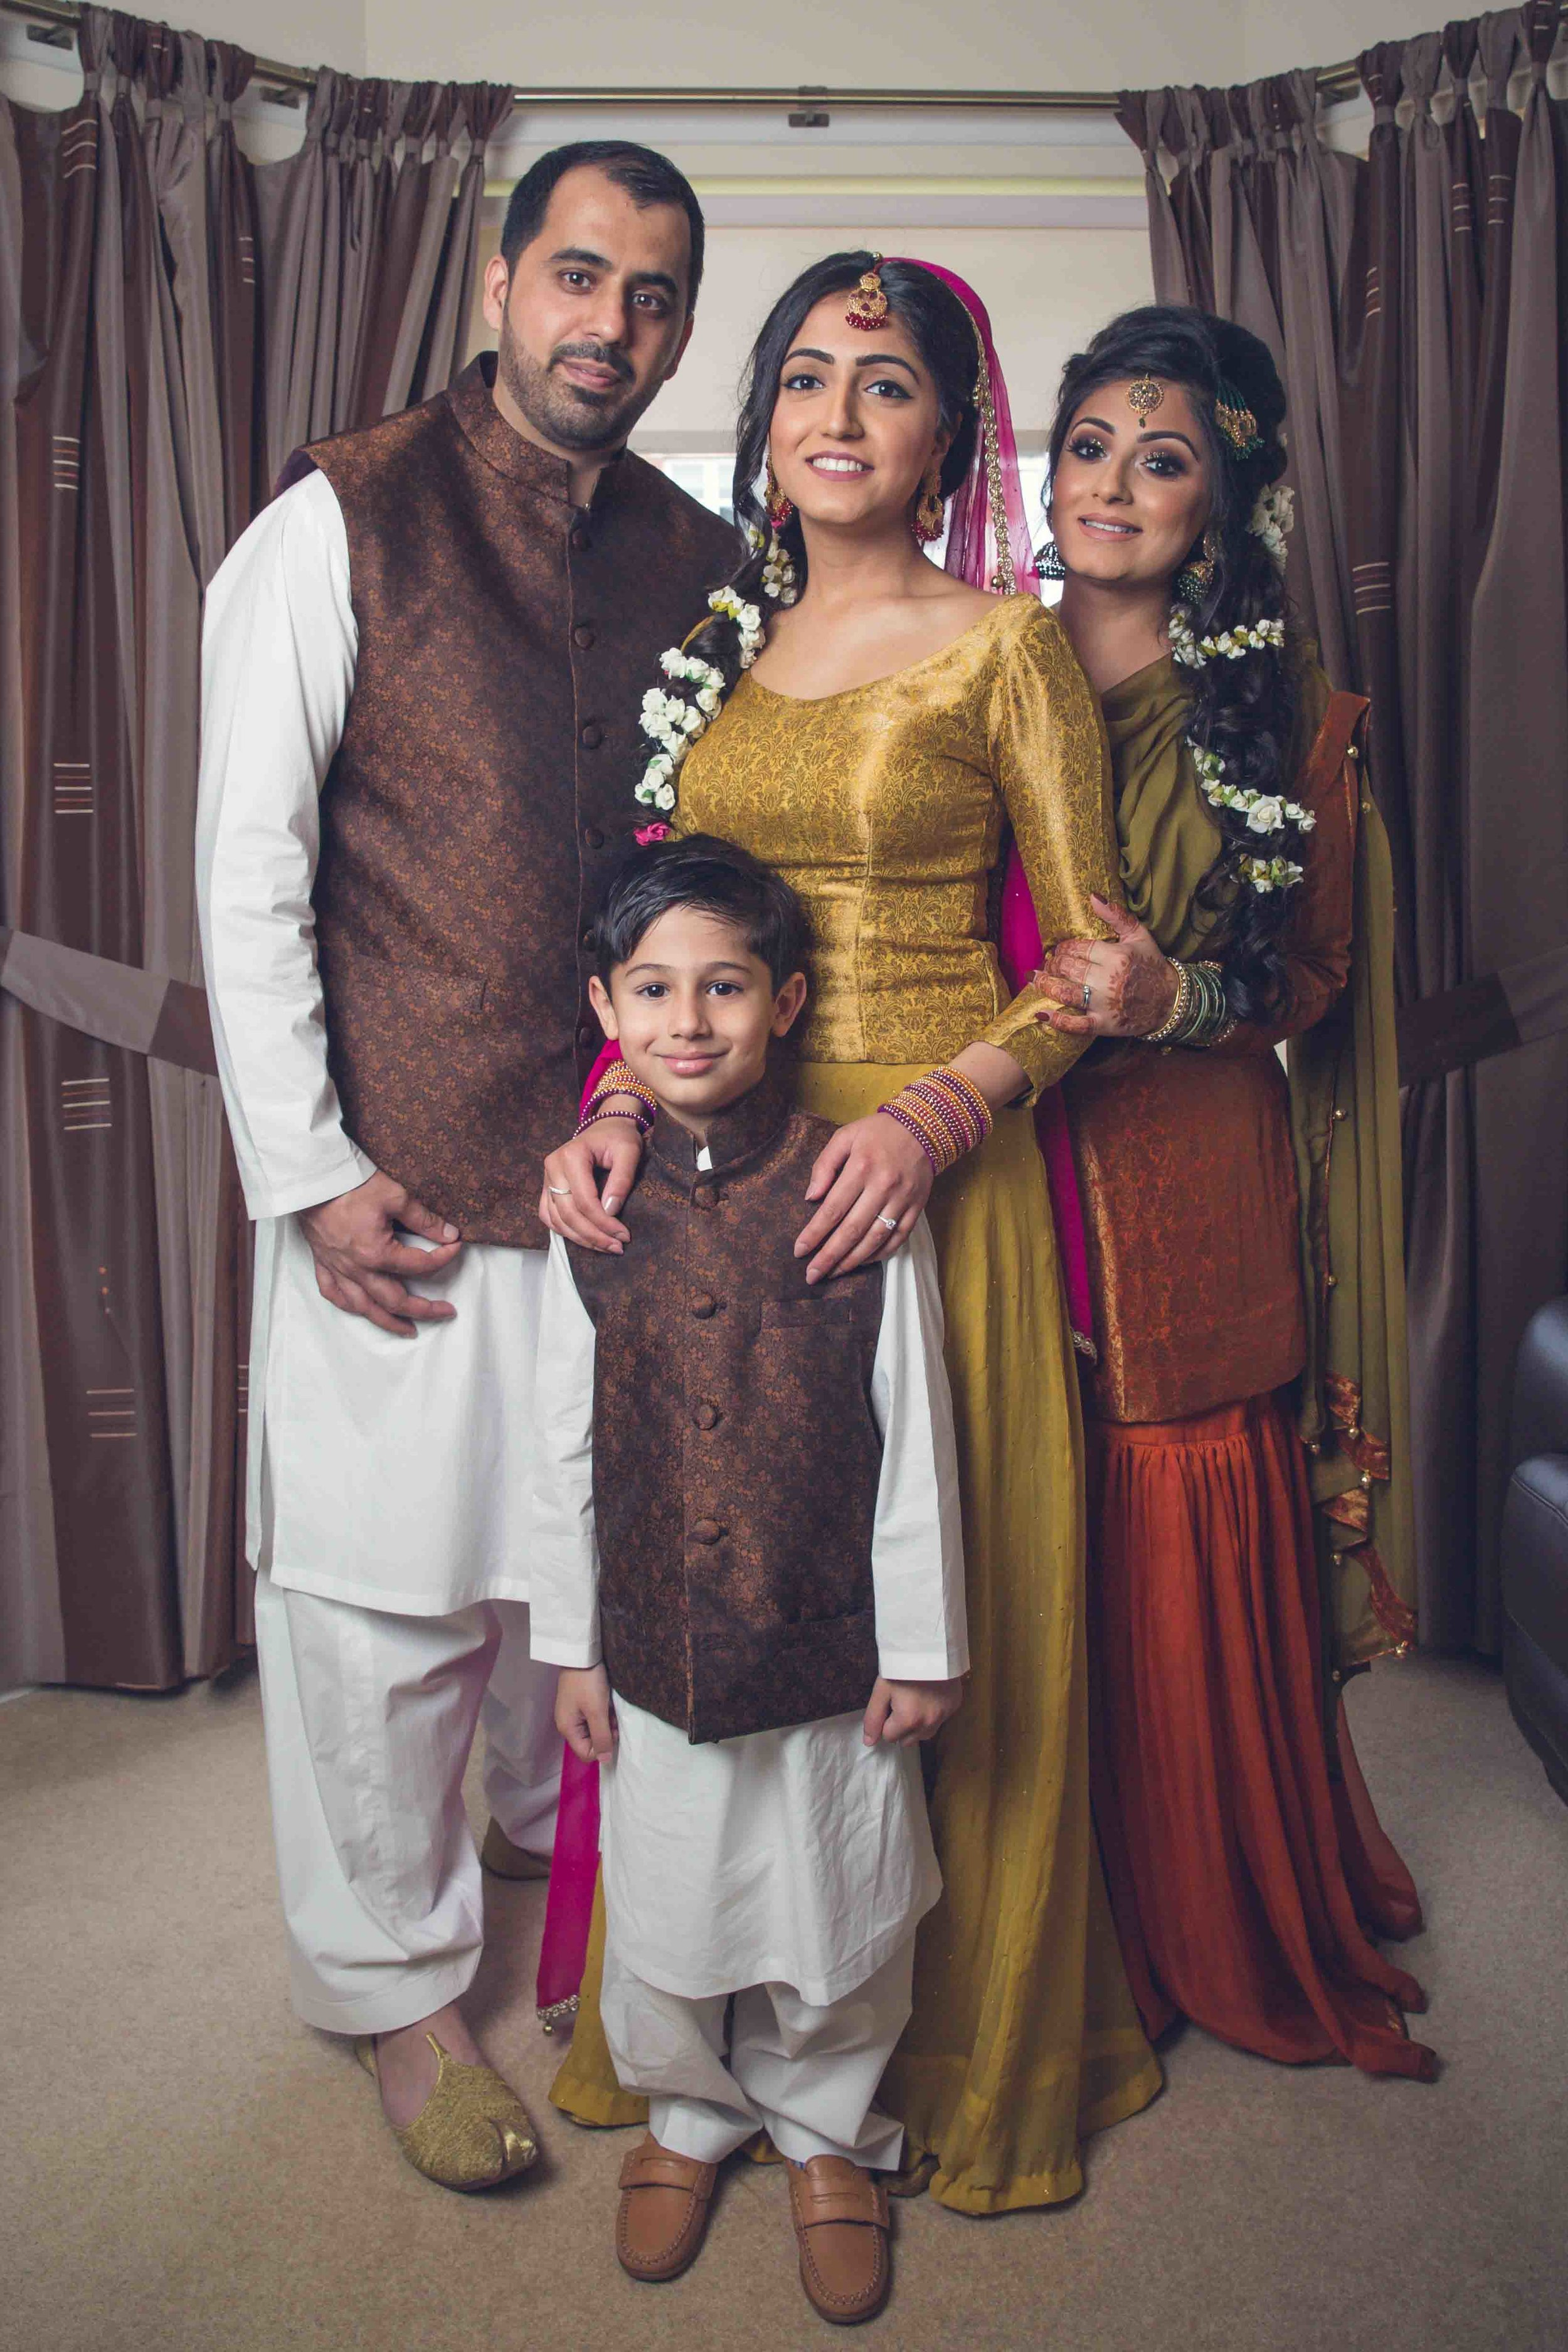 Opu Sultan Photography Asian wedding photography scotland edinburgh glasgow manchester birmingham london-4.jpg